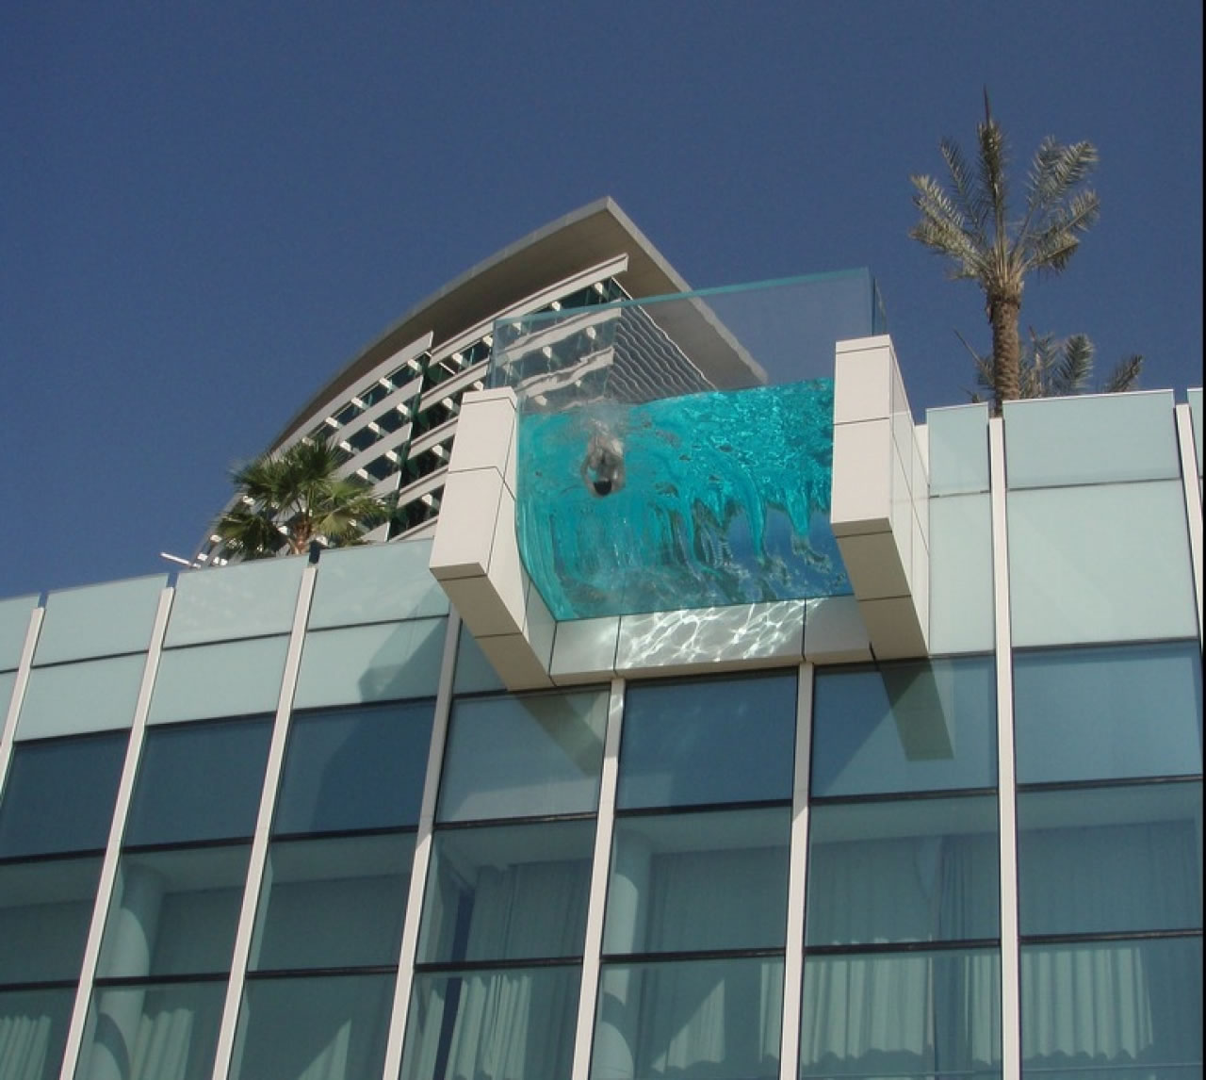 5 piscinas suspensas conhe a piscinas de tirar o f lego for No 1 hotel in dubai